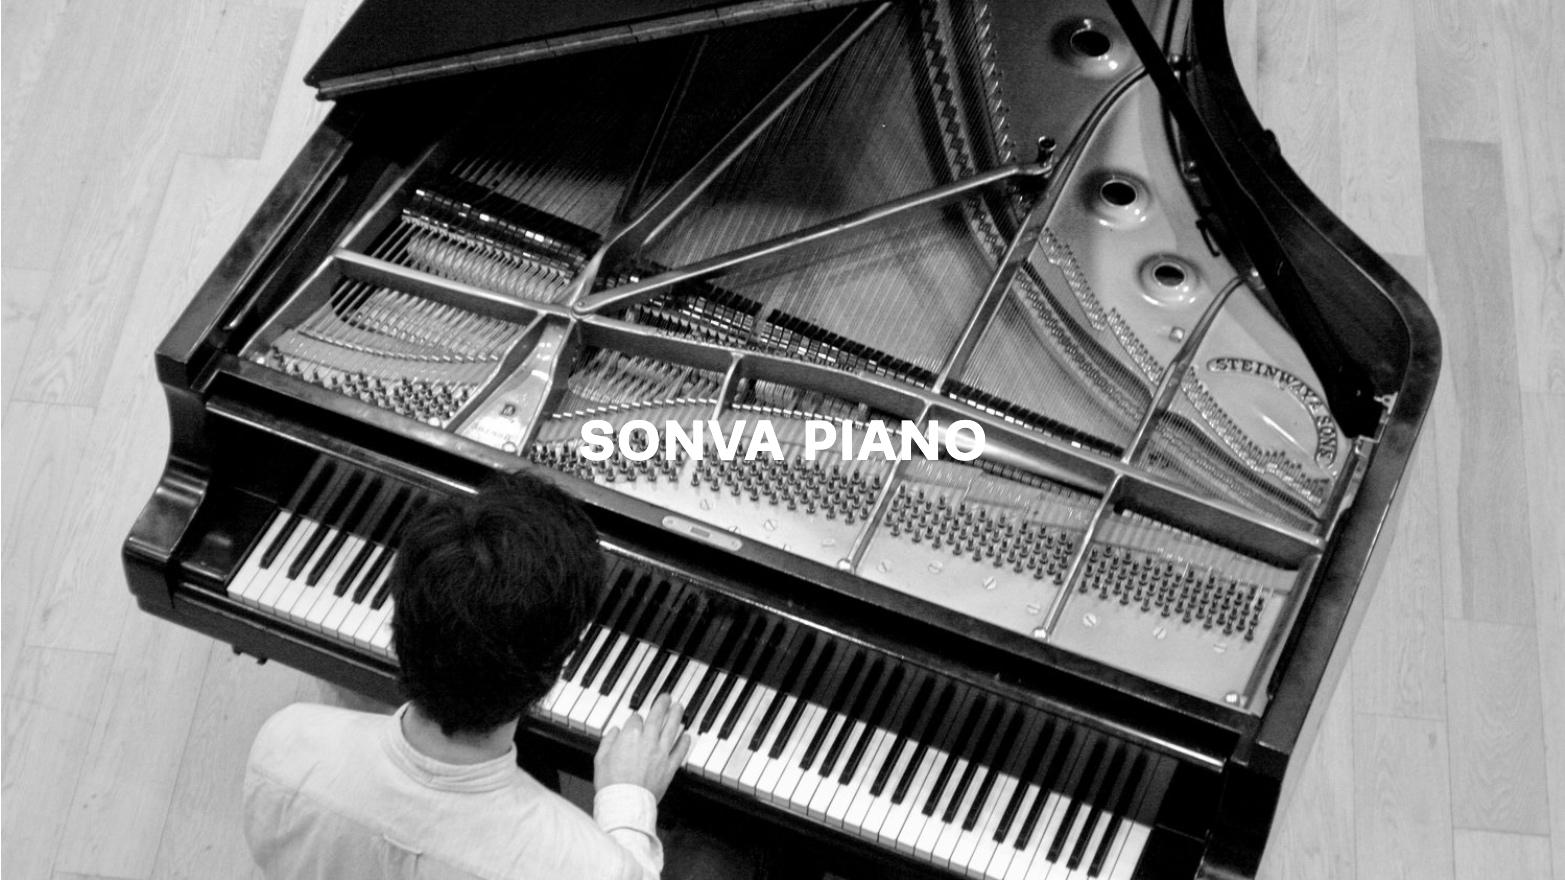 Sonva Piano Text.jpg